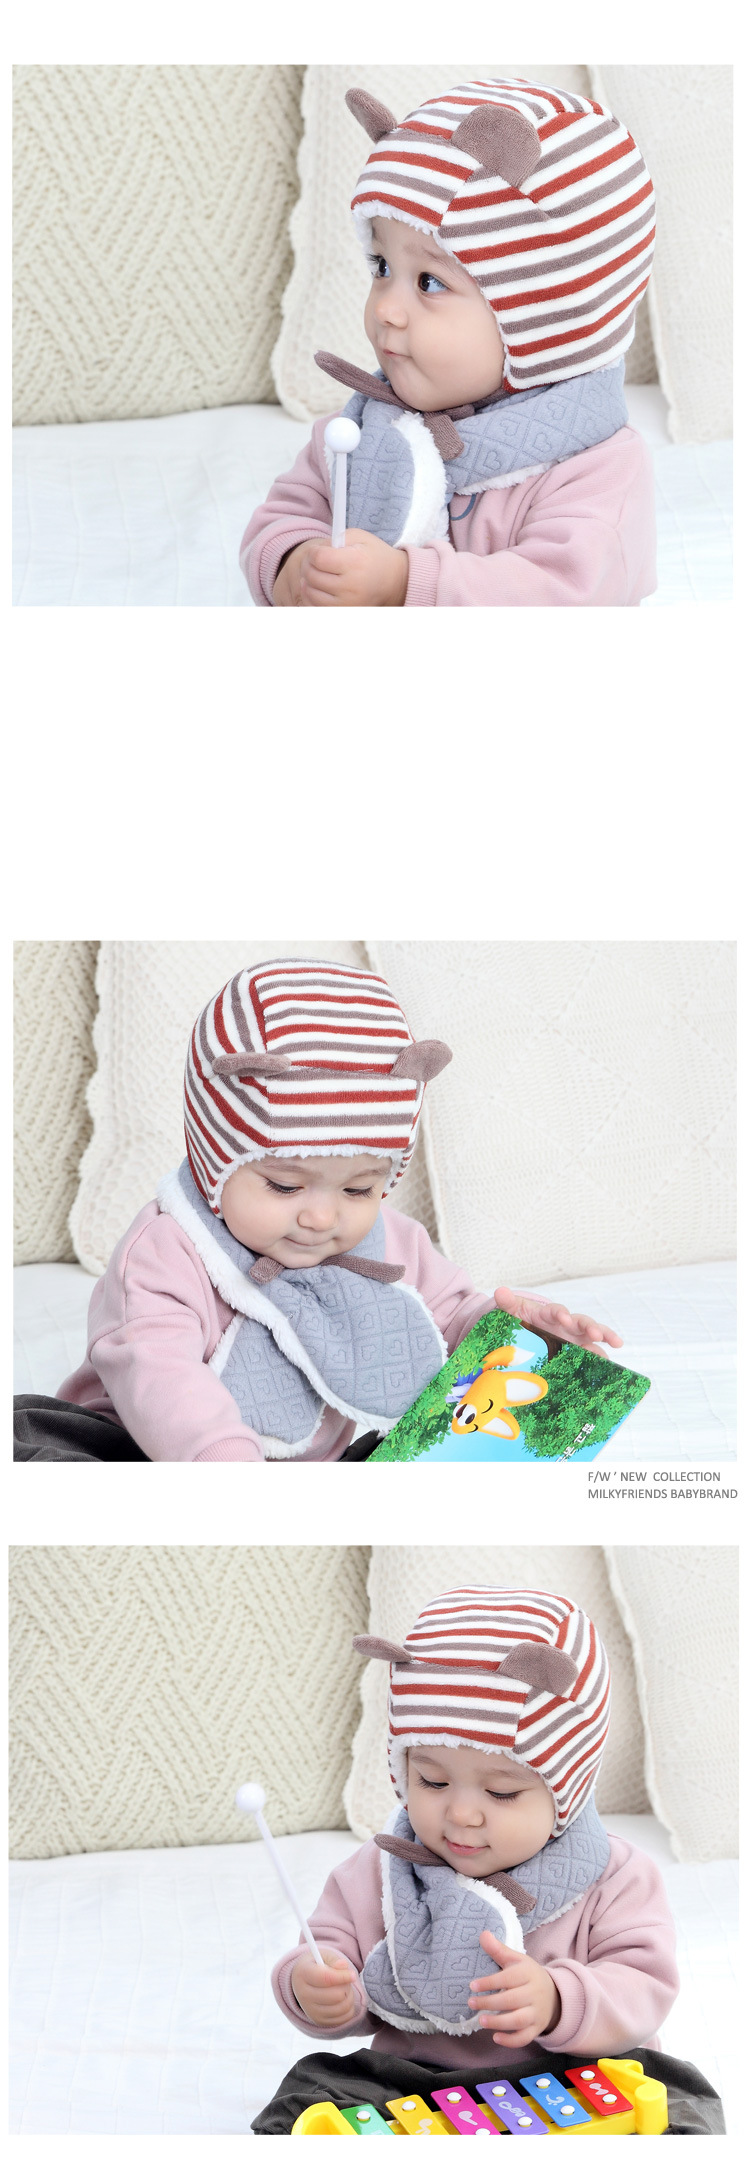 Emon children's winter baby bibs Warm Scarf Kid Heart Shape Pattern Baby boys girls Scarf Neck With Velvet Thickening muffle (9)